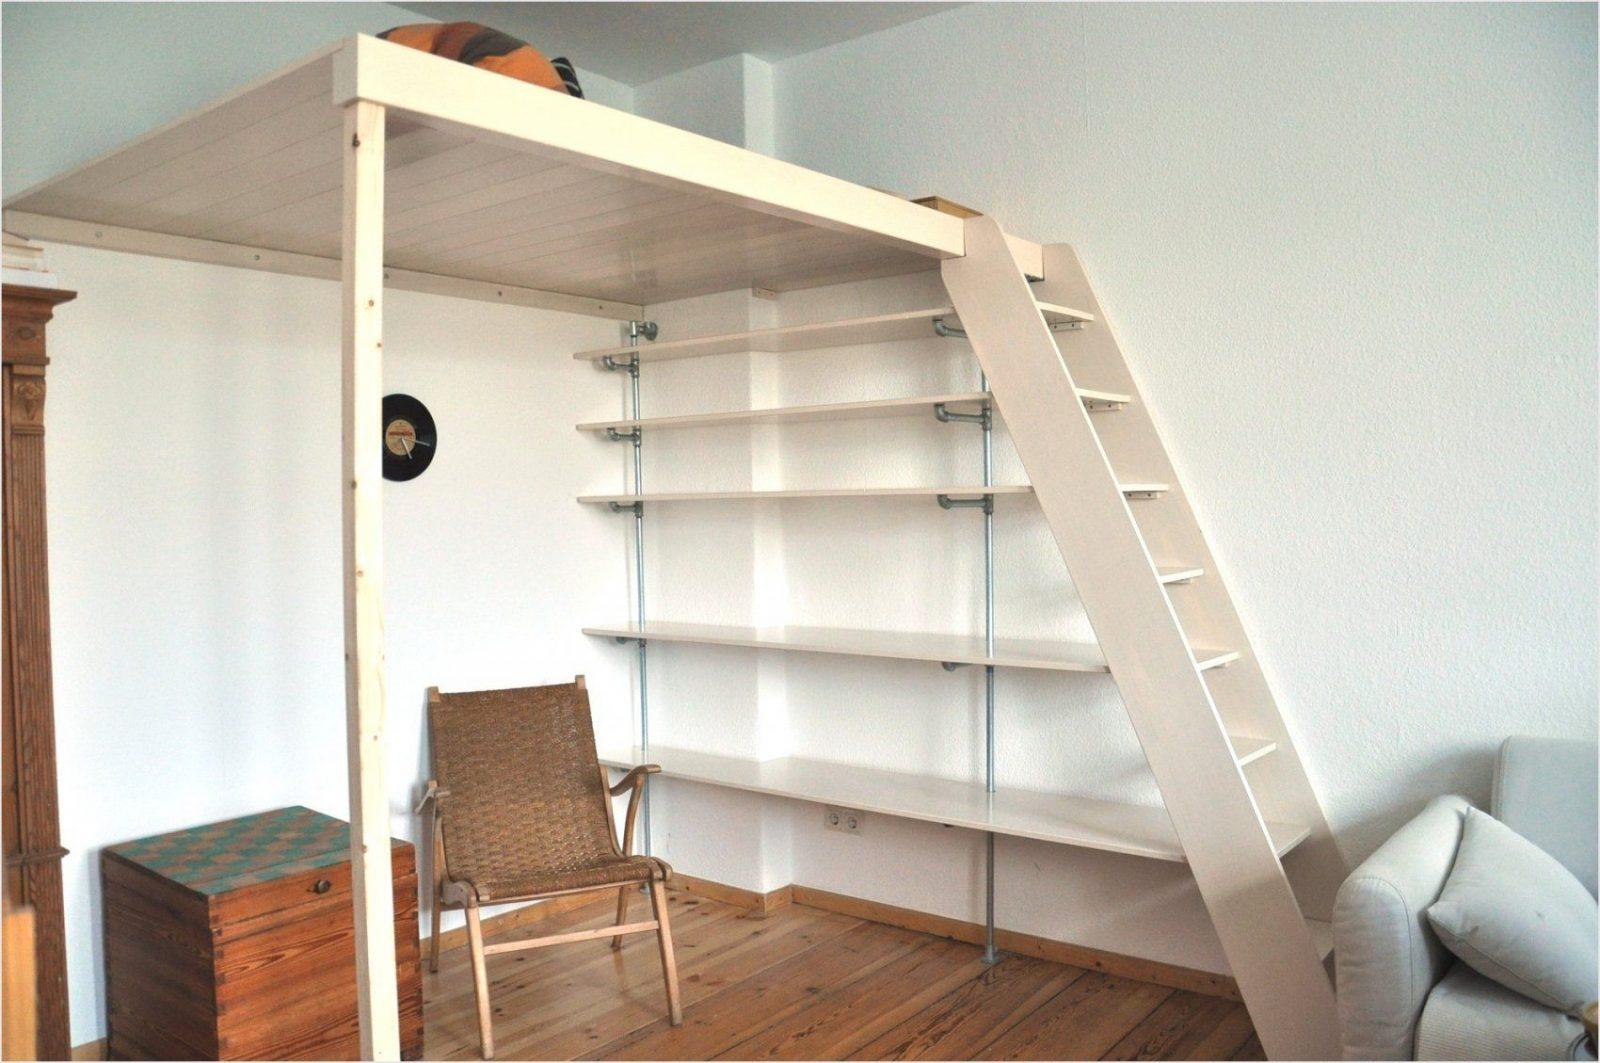 Faszinierend Stilvoll Hochbett Zum Hochbett Selbst Gebaut Avec von Hochbett Selber Bauen 90X200 Bild